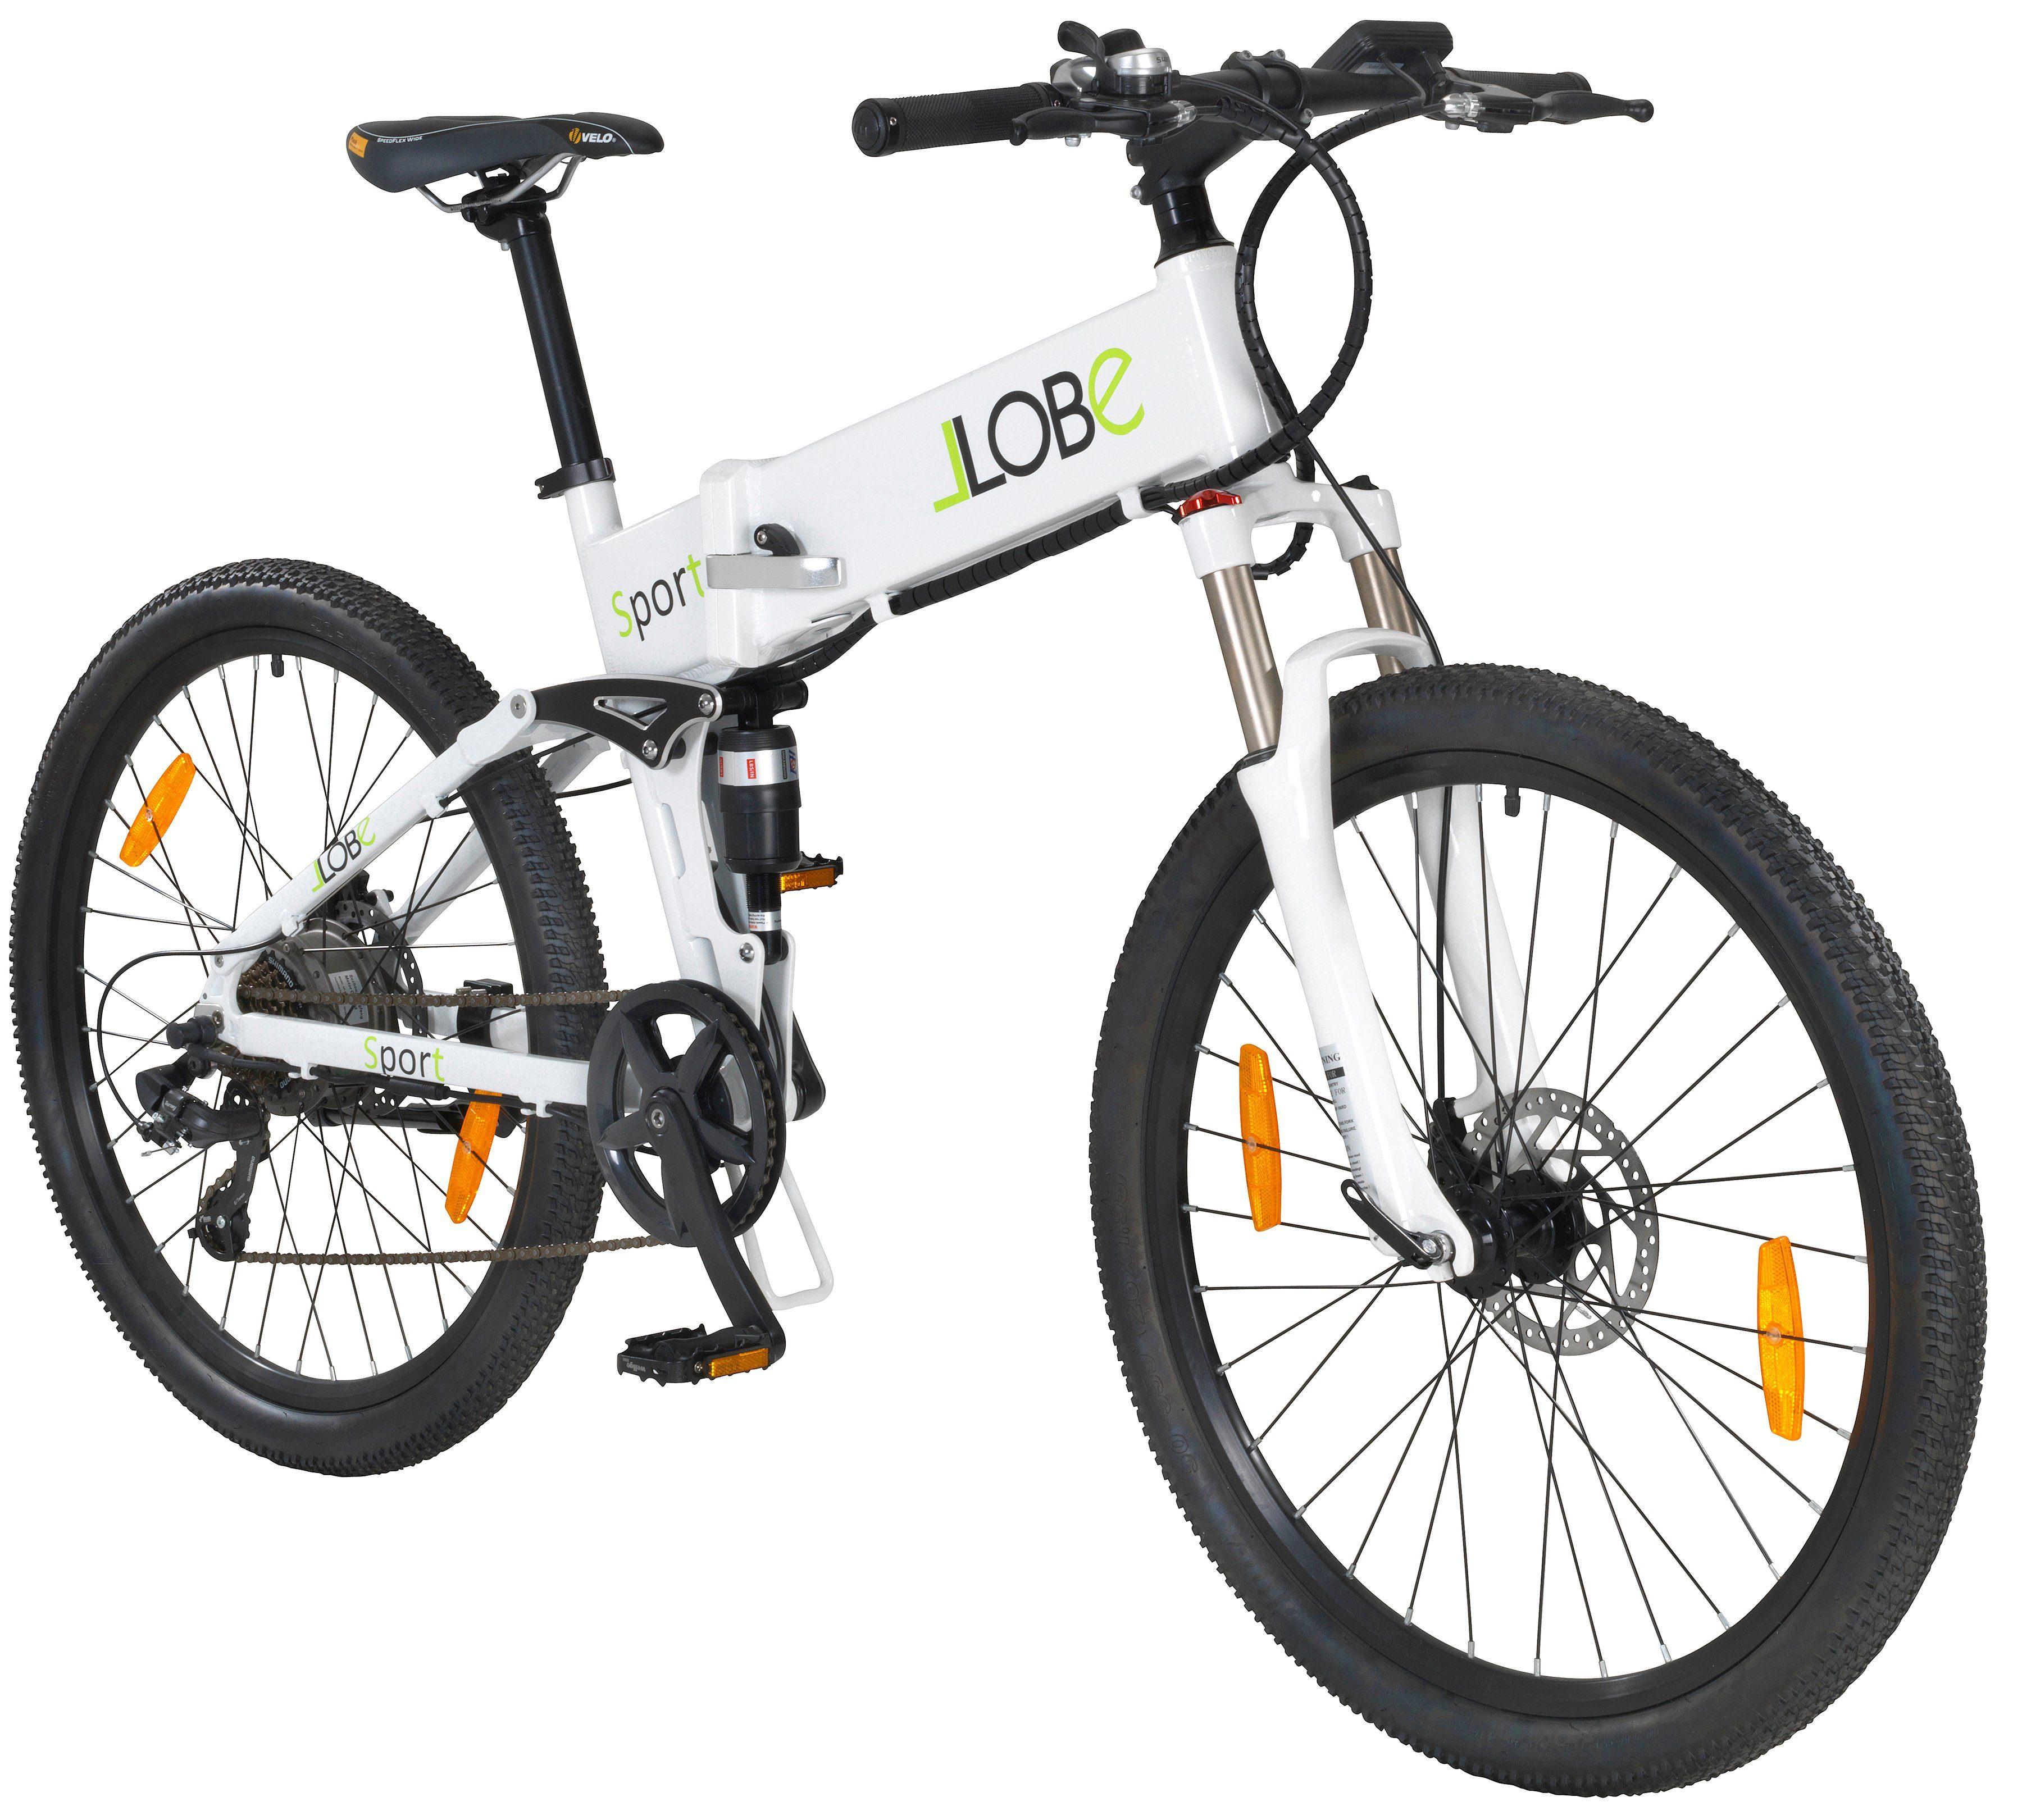 LLOBE E-Bike Klapprad »Sport«, 26 Zoll, 7 Gang, Heckmotor, 281 Wh